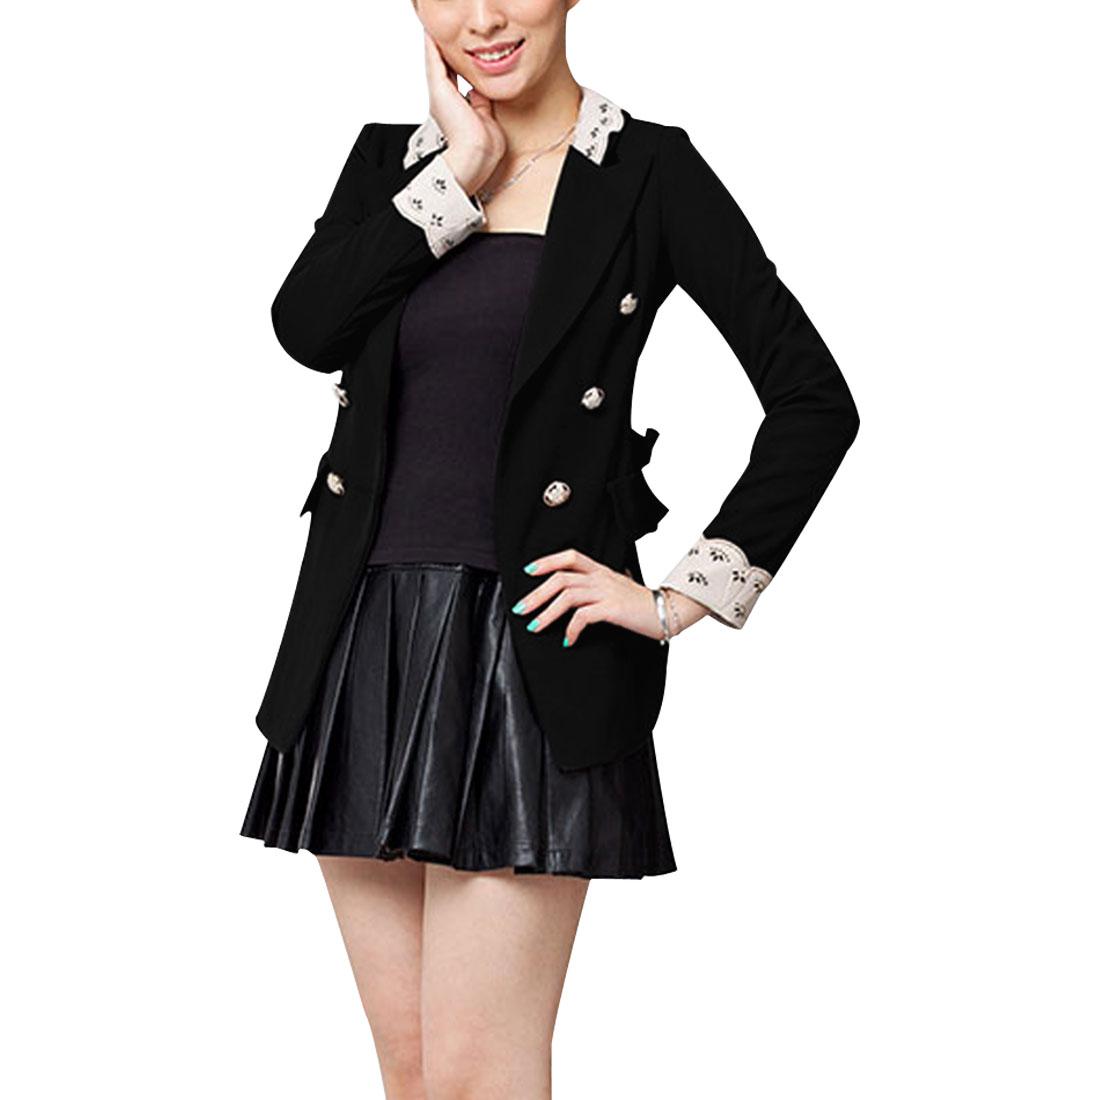 Women Peaked Lapel Double Breasted Blazer Coat Black S